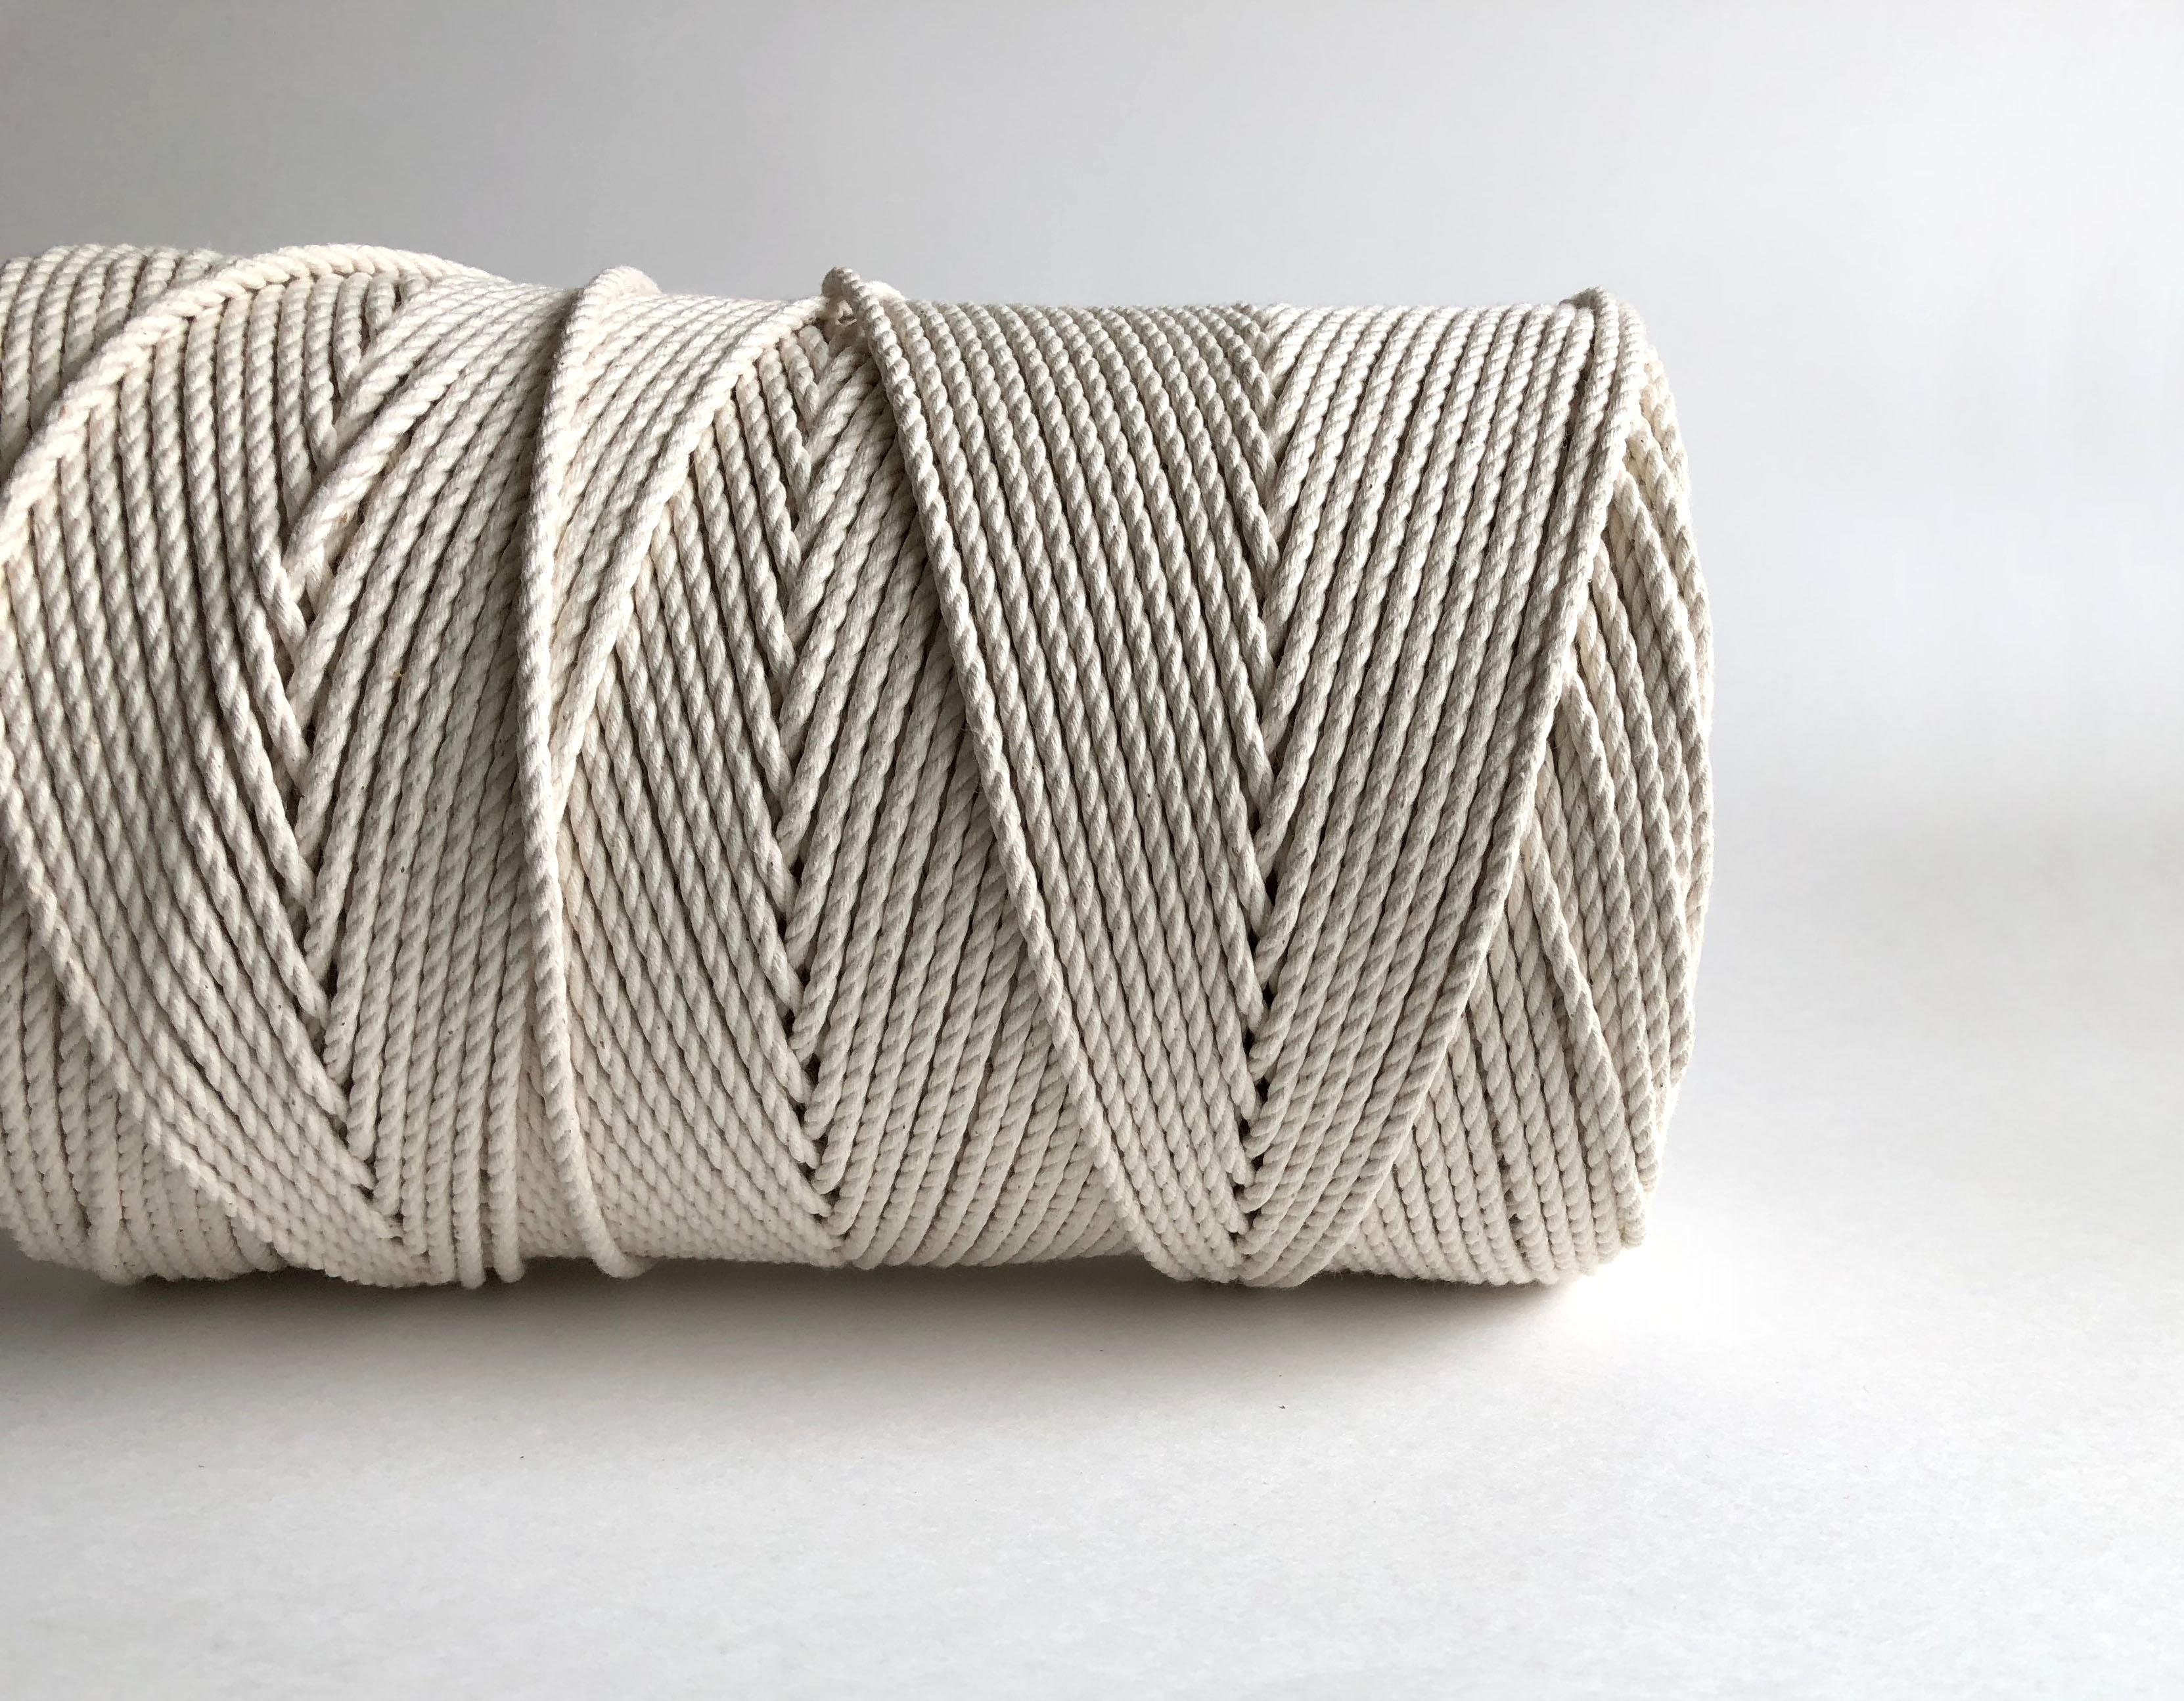 3 Strand Macrame Rope Fiber Art Cord 100 Cotton Rmc